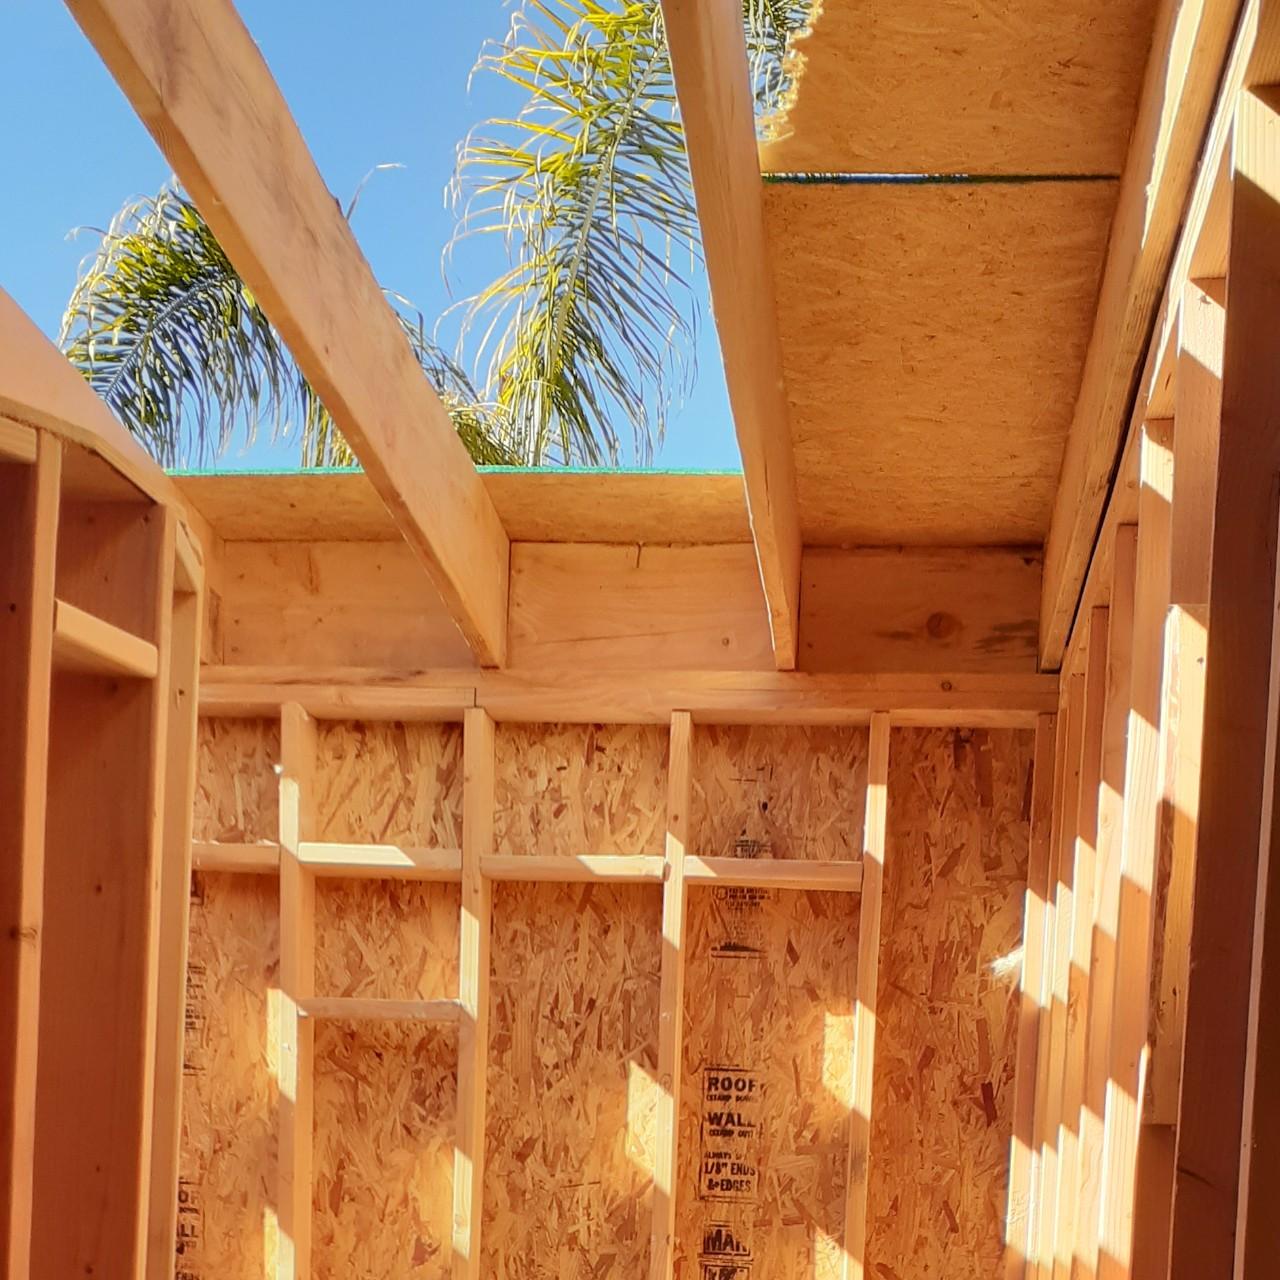 carpentry-wood-framing-second-floor-home-addition--framing-47